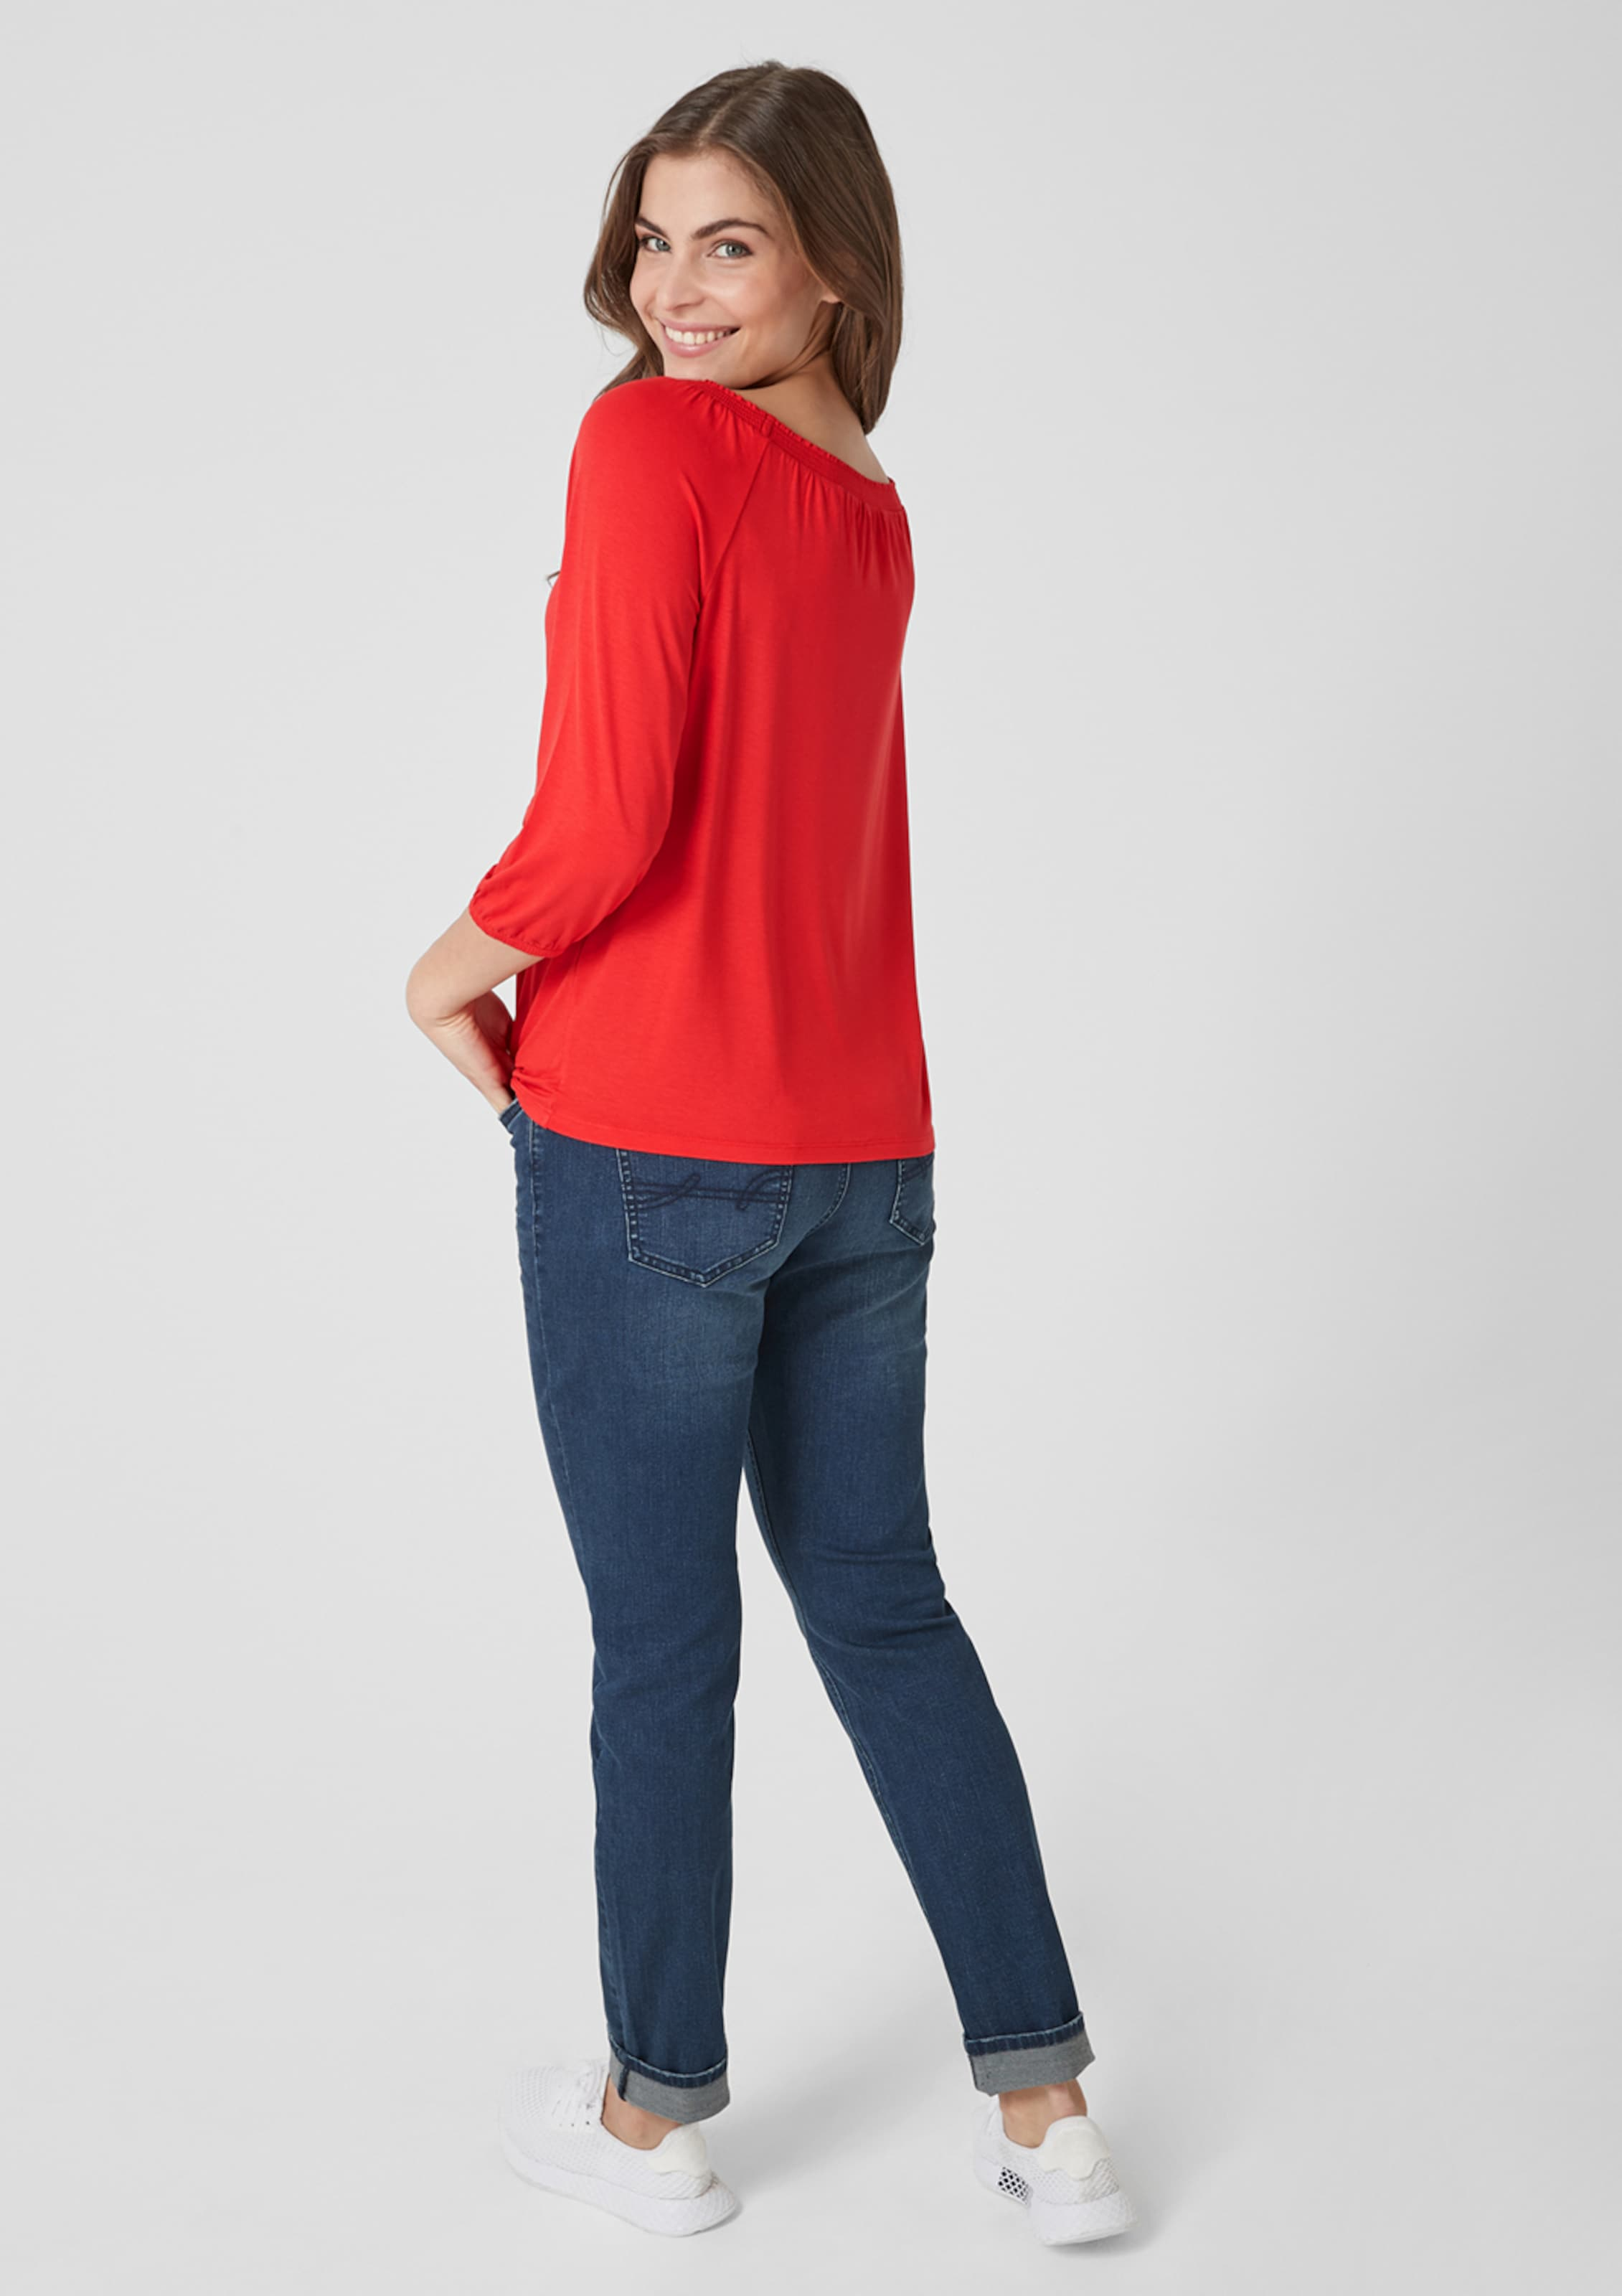 Shirt Triangle Shirt Rot Rot Triangle In Shirt Rot In In Triangle Triangle xCBdoe